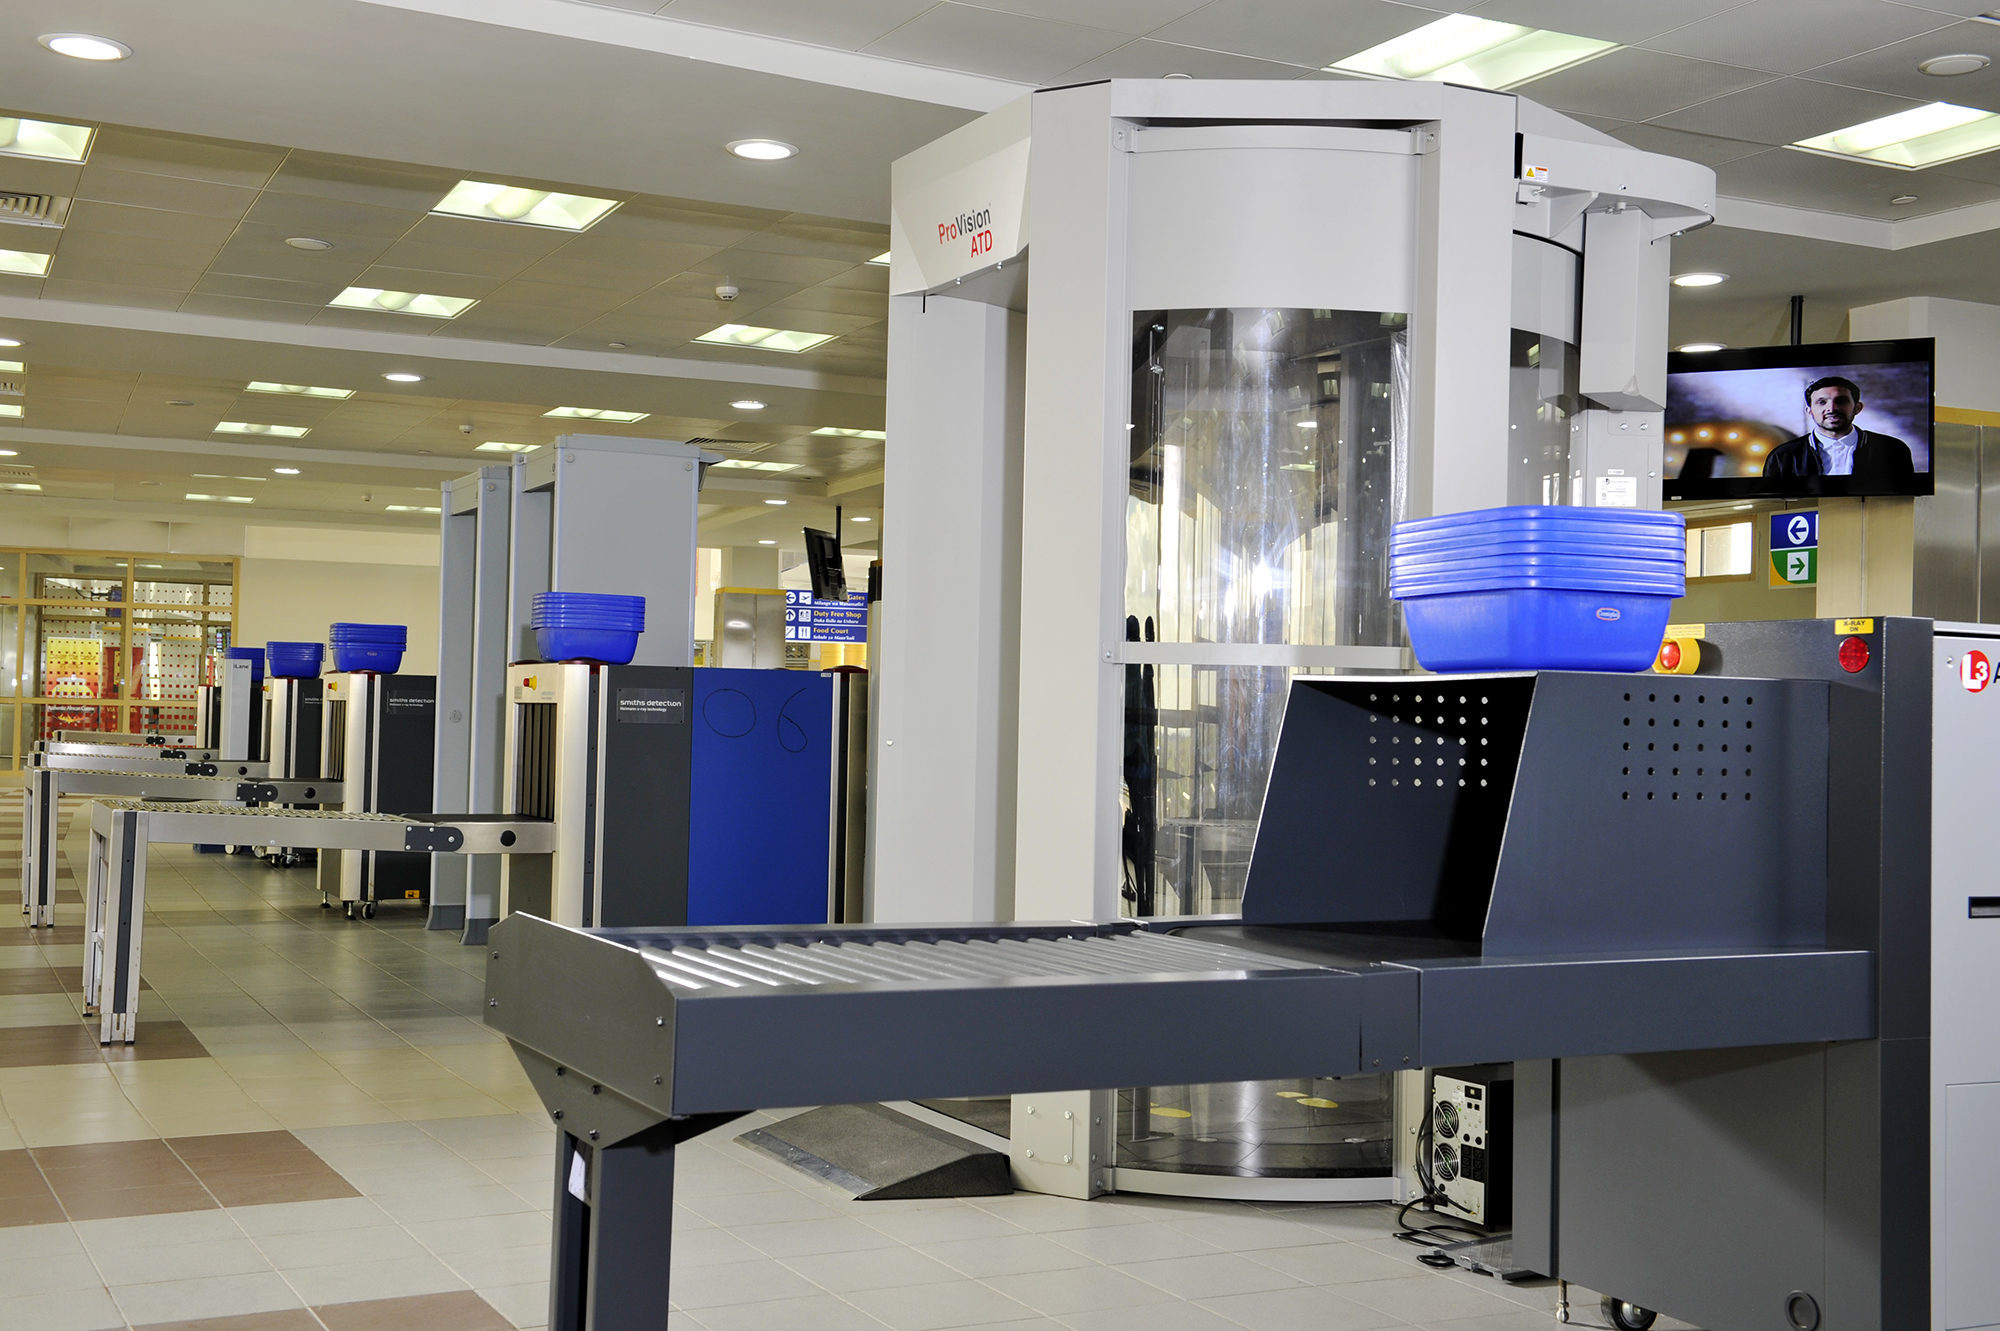 Kenya Airports Authority : Security Regulations